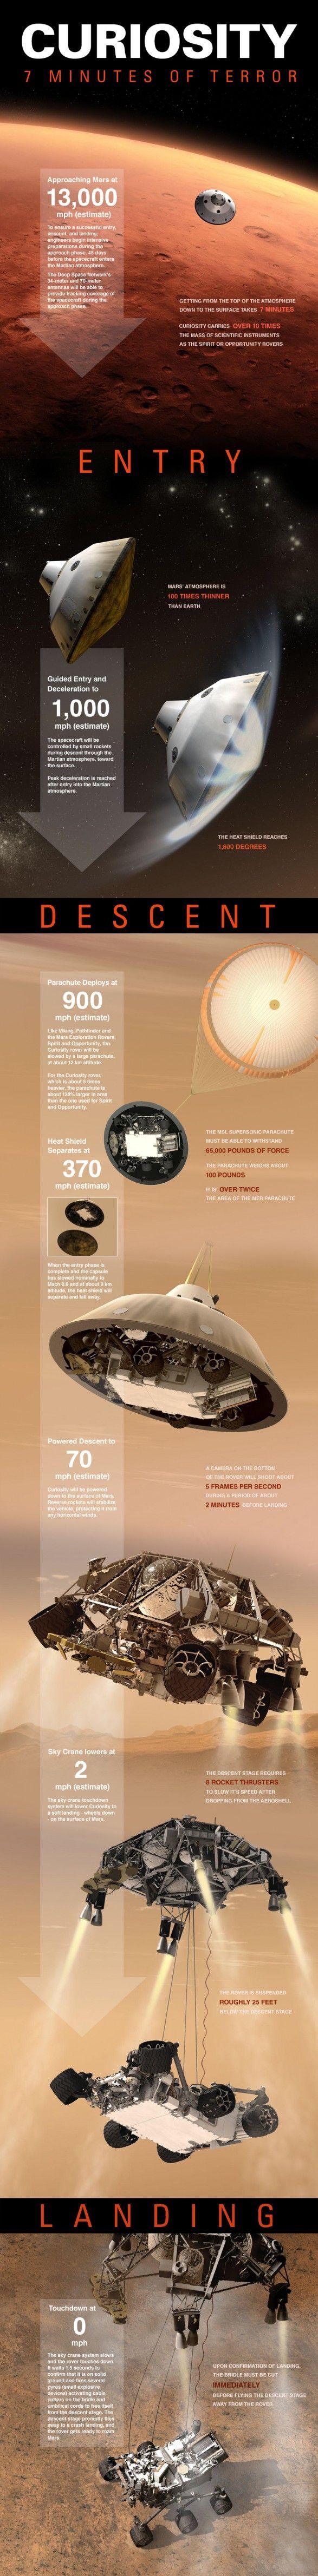 Curiosity Mars Exploration - 7 minutes of terror.